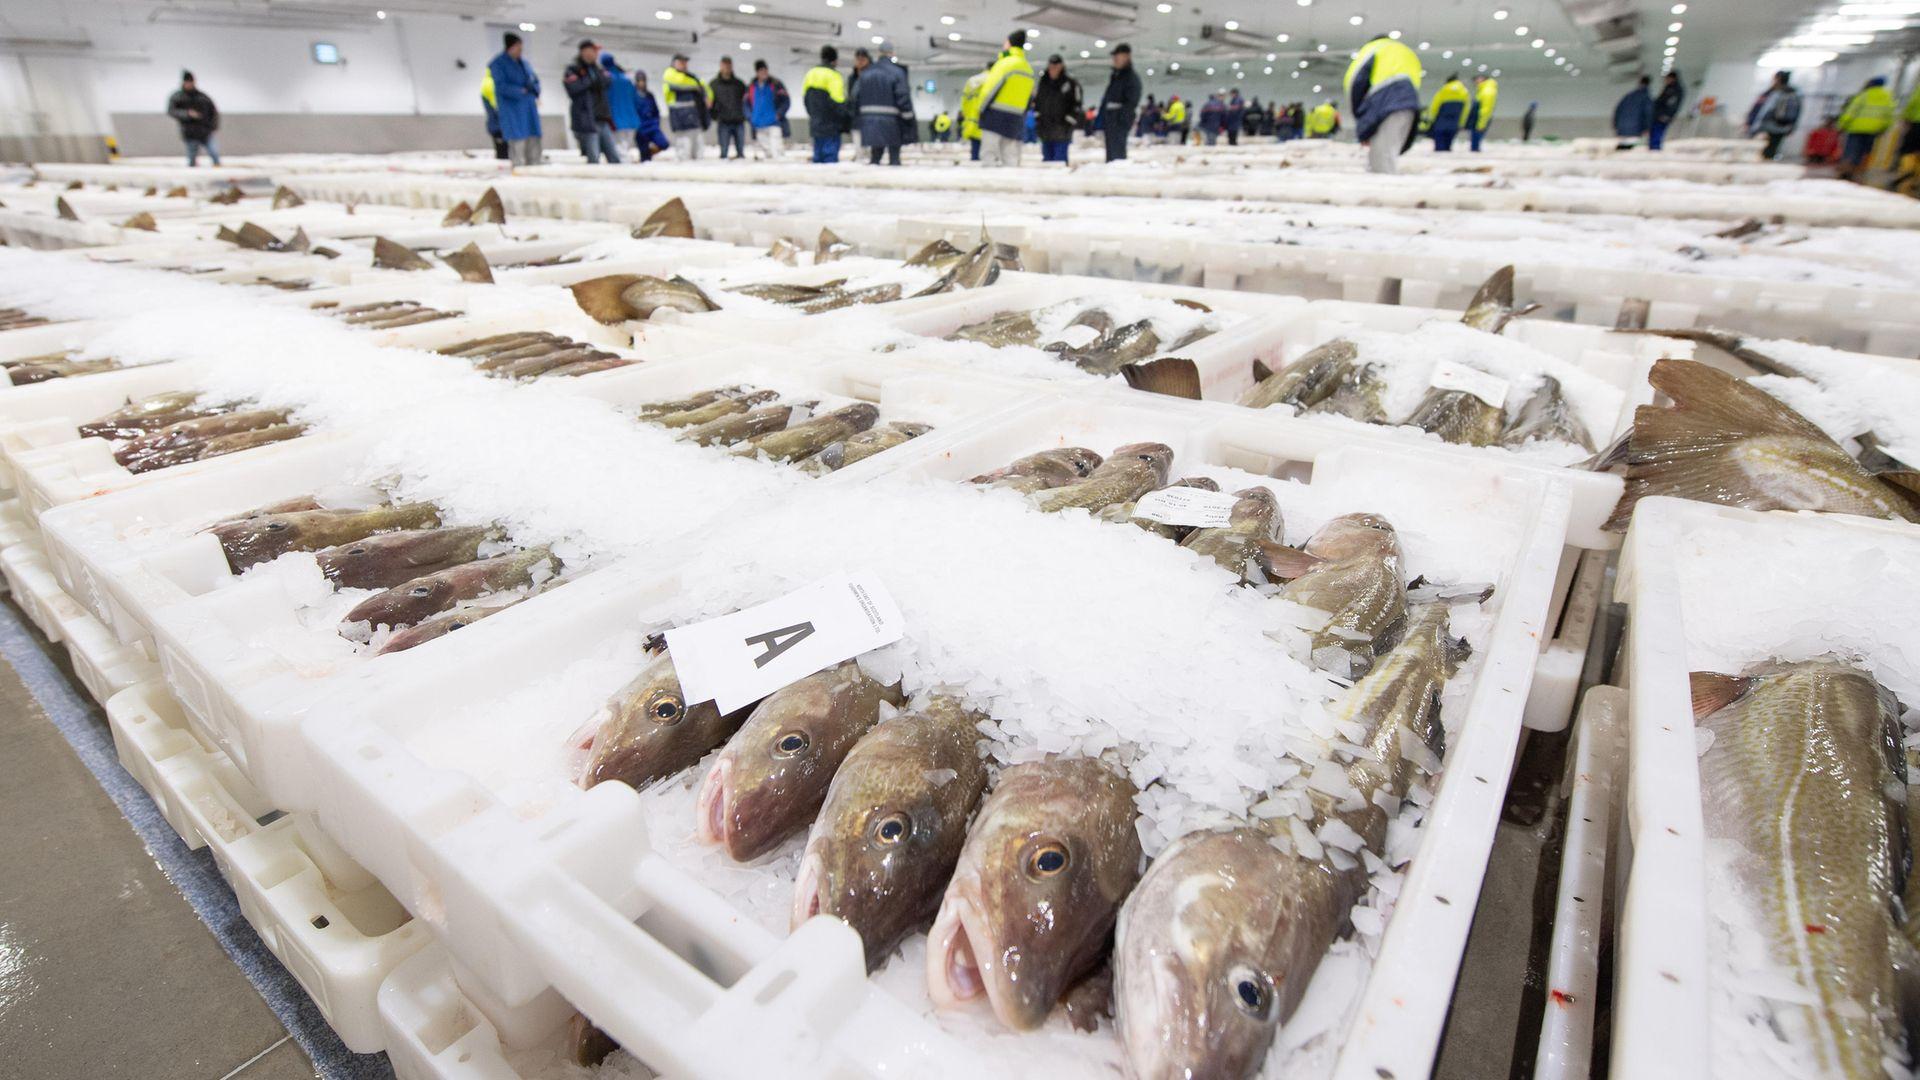 Fish merchants view trays of fish at Peterhead Fish Market in Aberdeenshire - Credit: PA